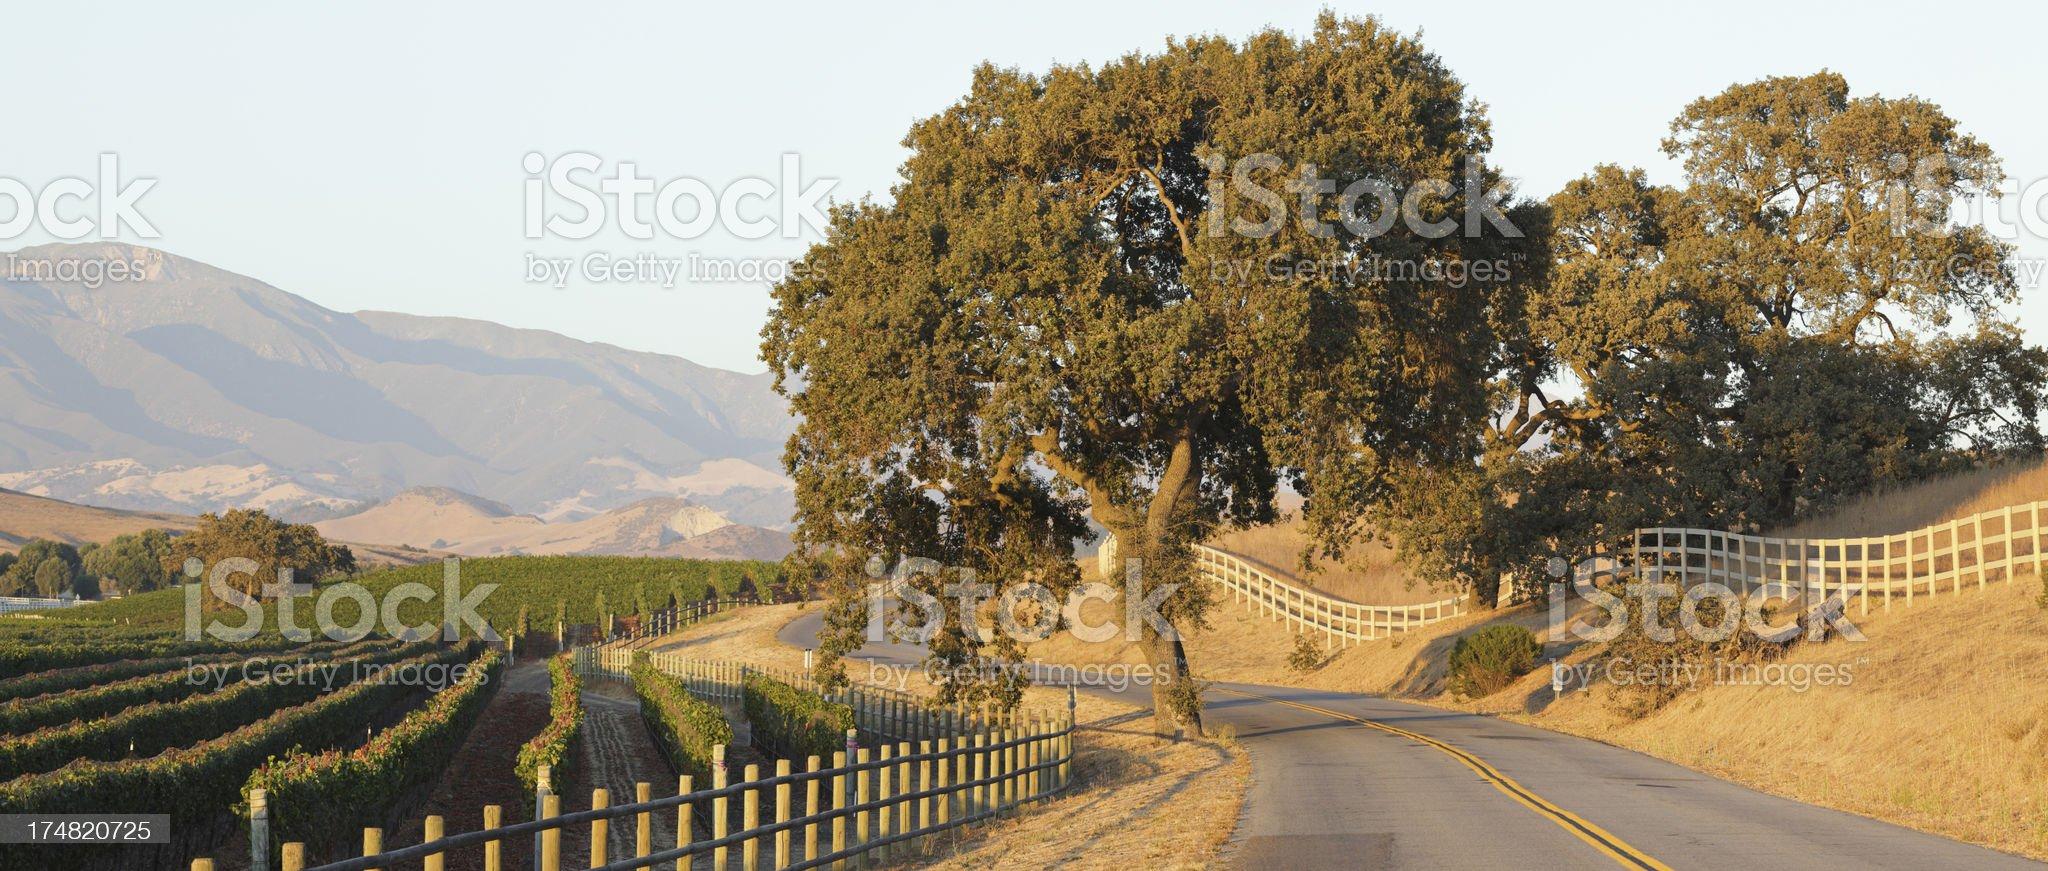 Winding Road and Vineyard royalty-free stock photo